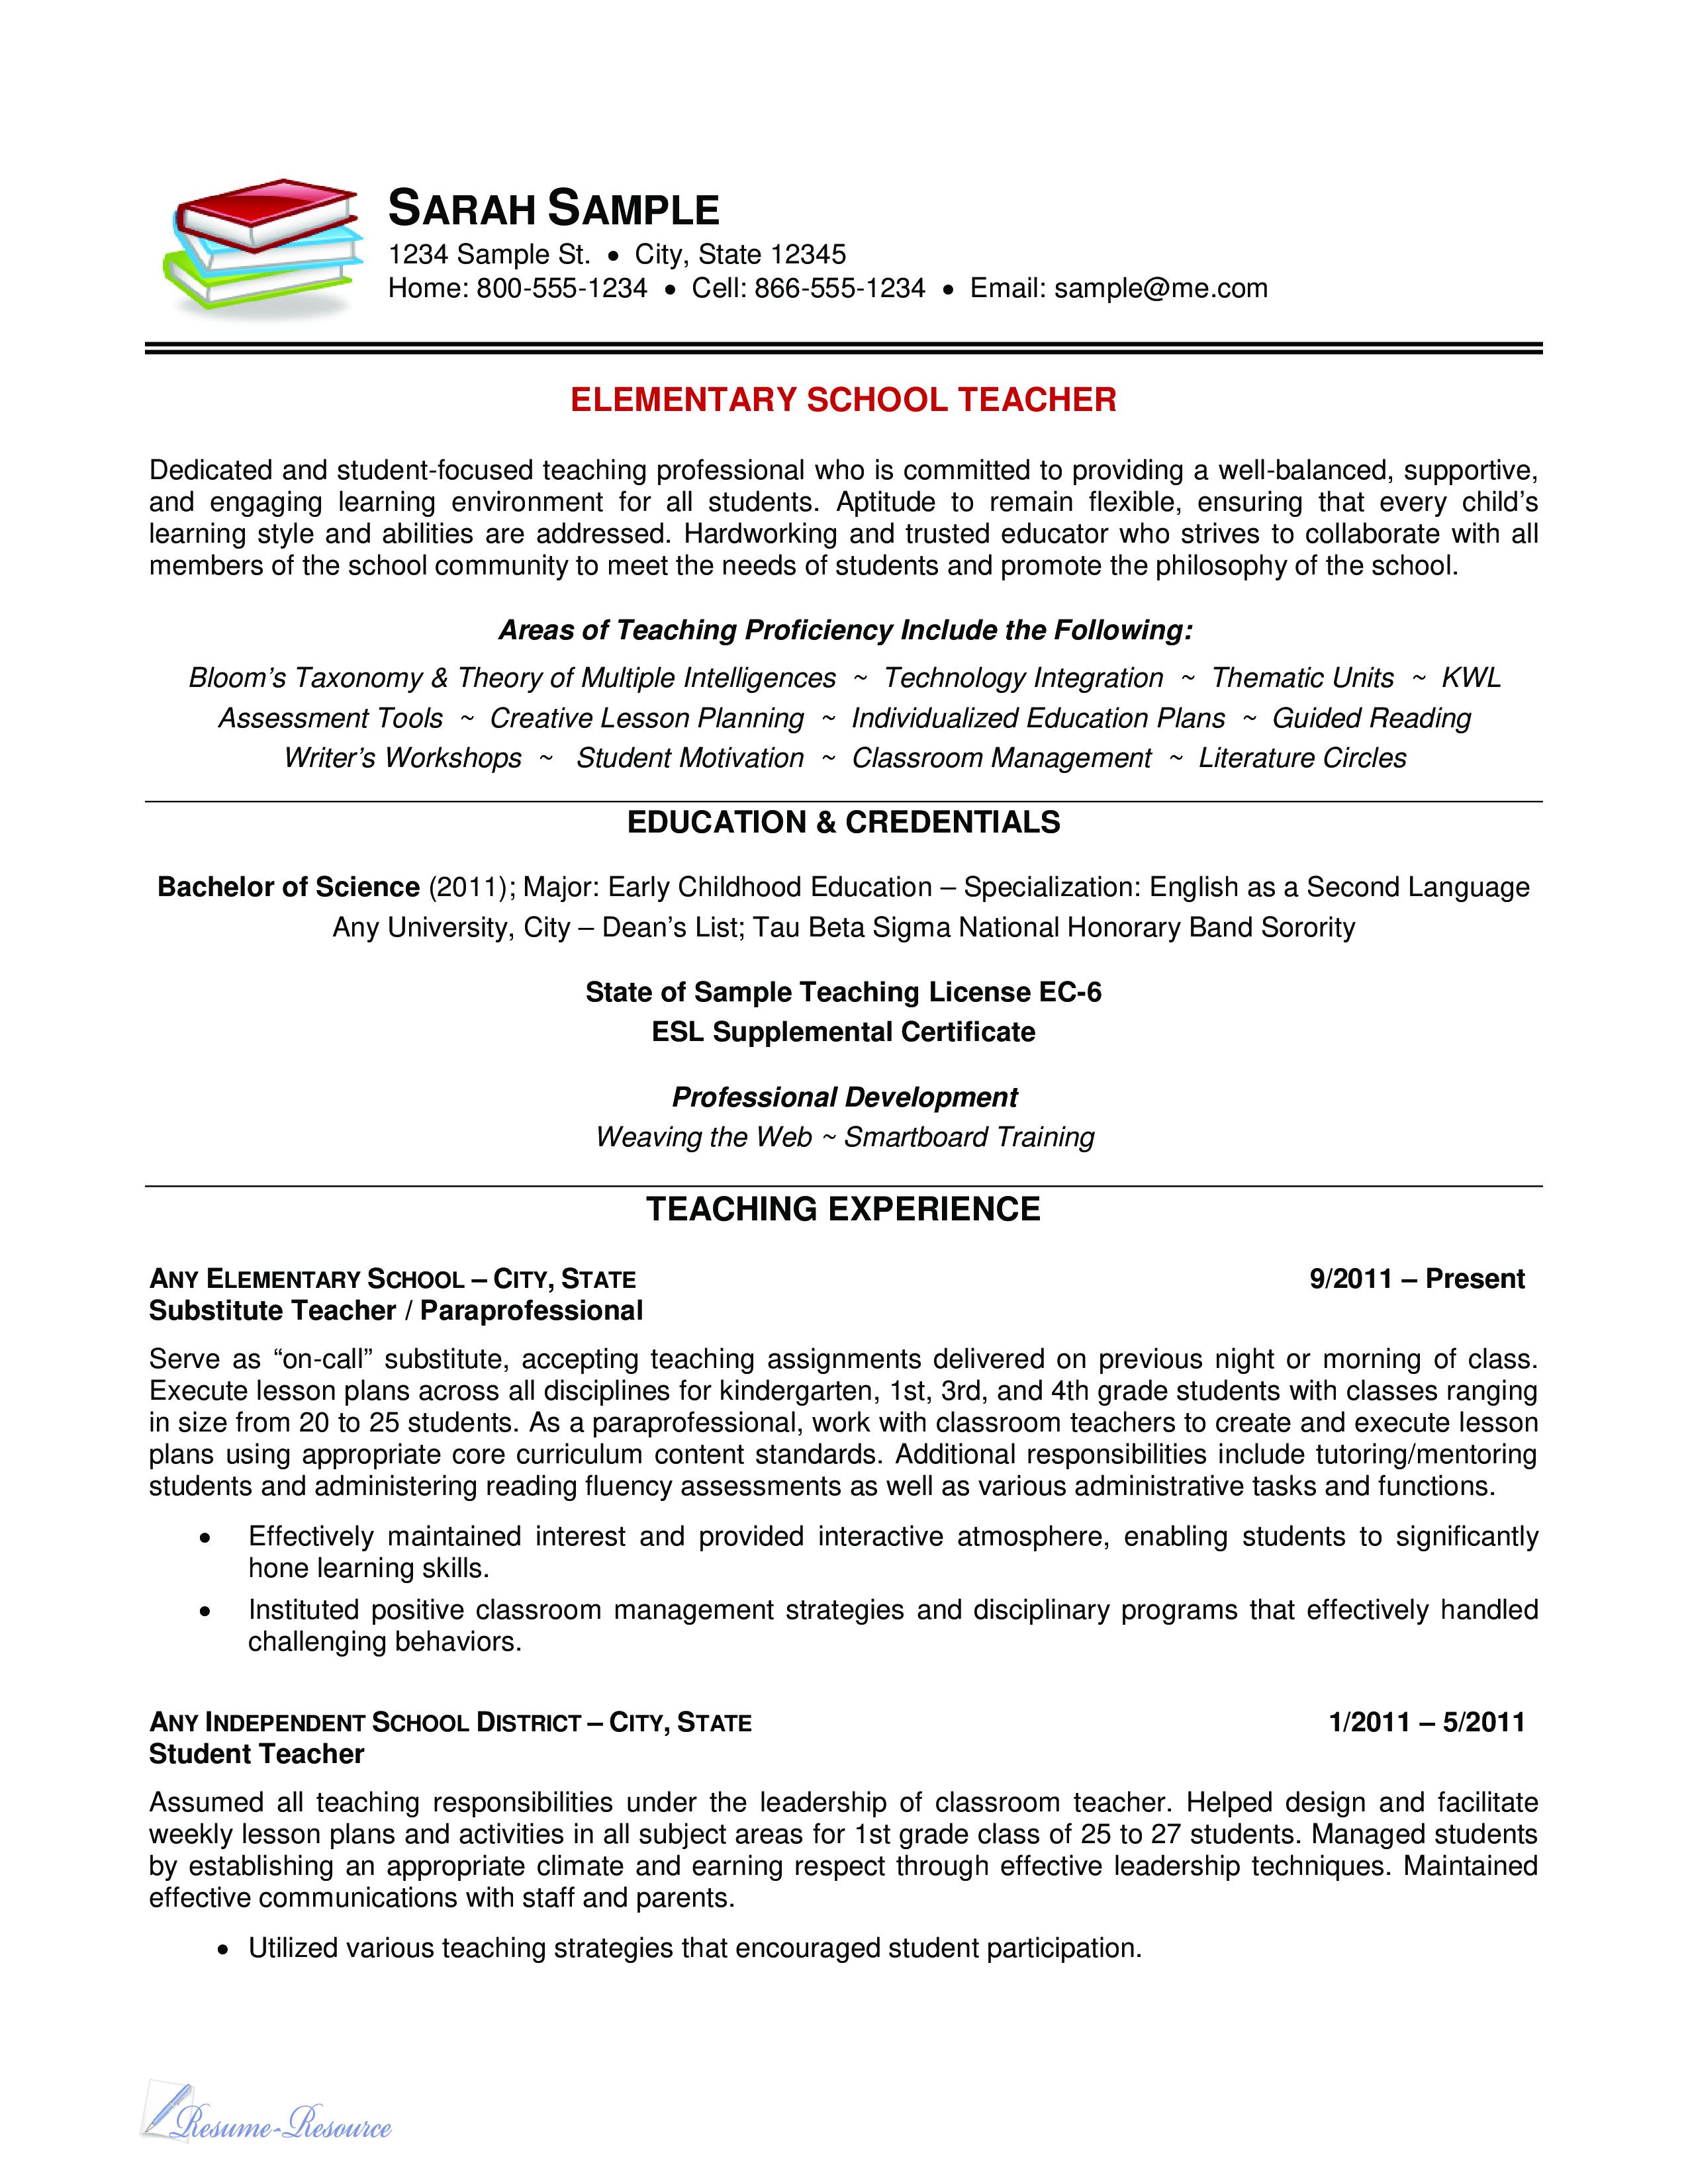 Free Elementary School Teacher | Templates at allbusinesstemplates.com